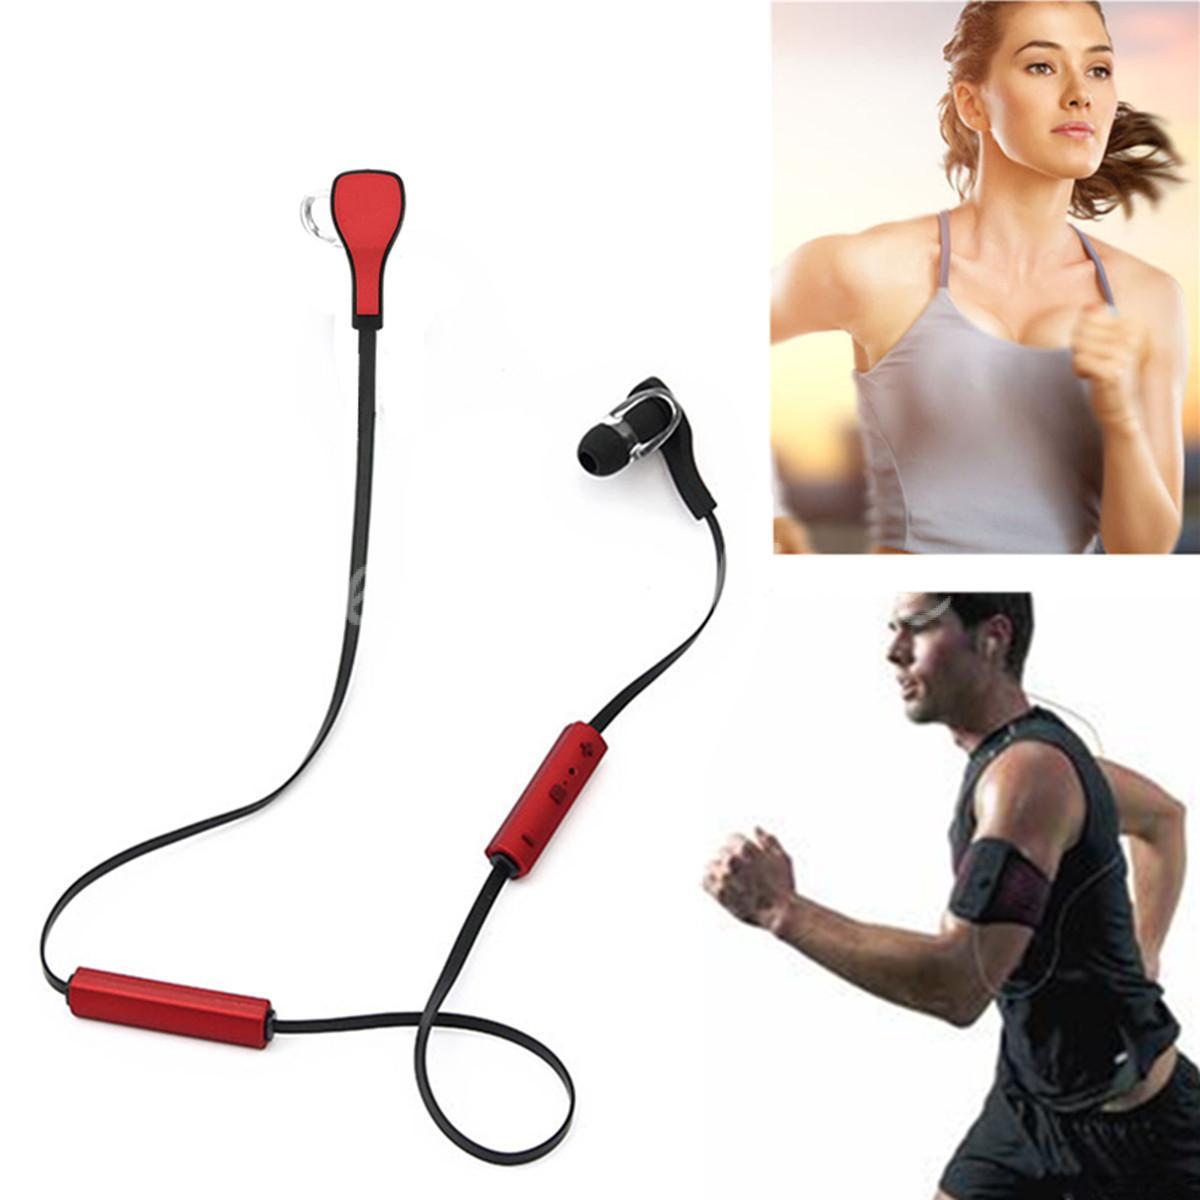 NEW Bluetooth Earphone Sport Stereo Handsfree In Ear Bluetooth Sweatproof Earphone Wireless With Mic For iPhone история и теория социальной политики учебное пособие